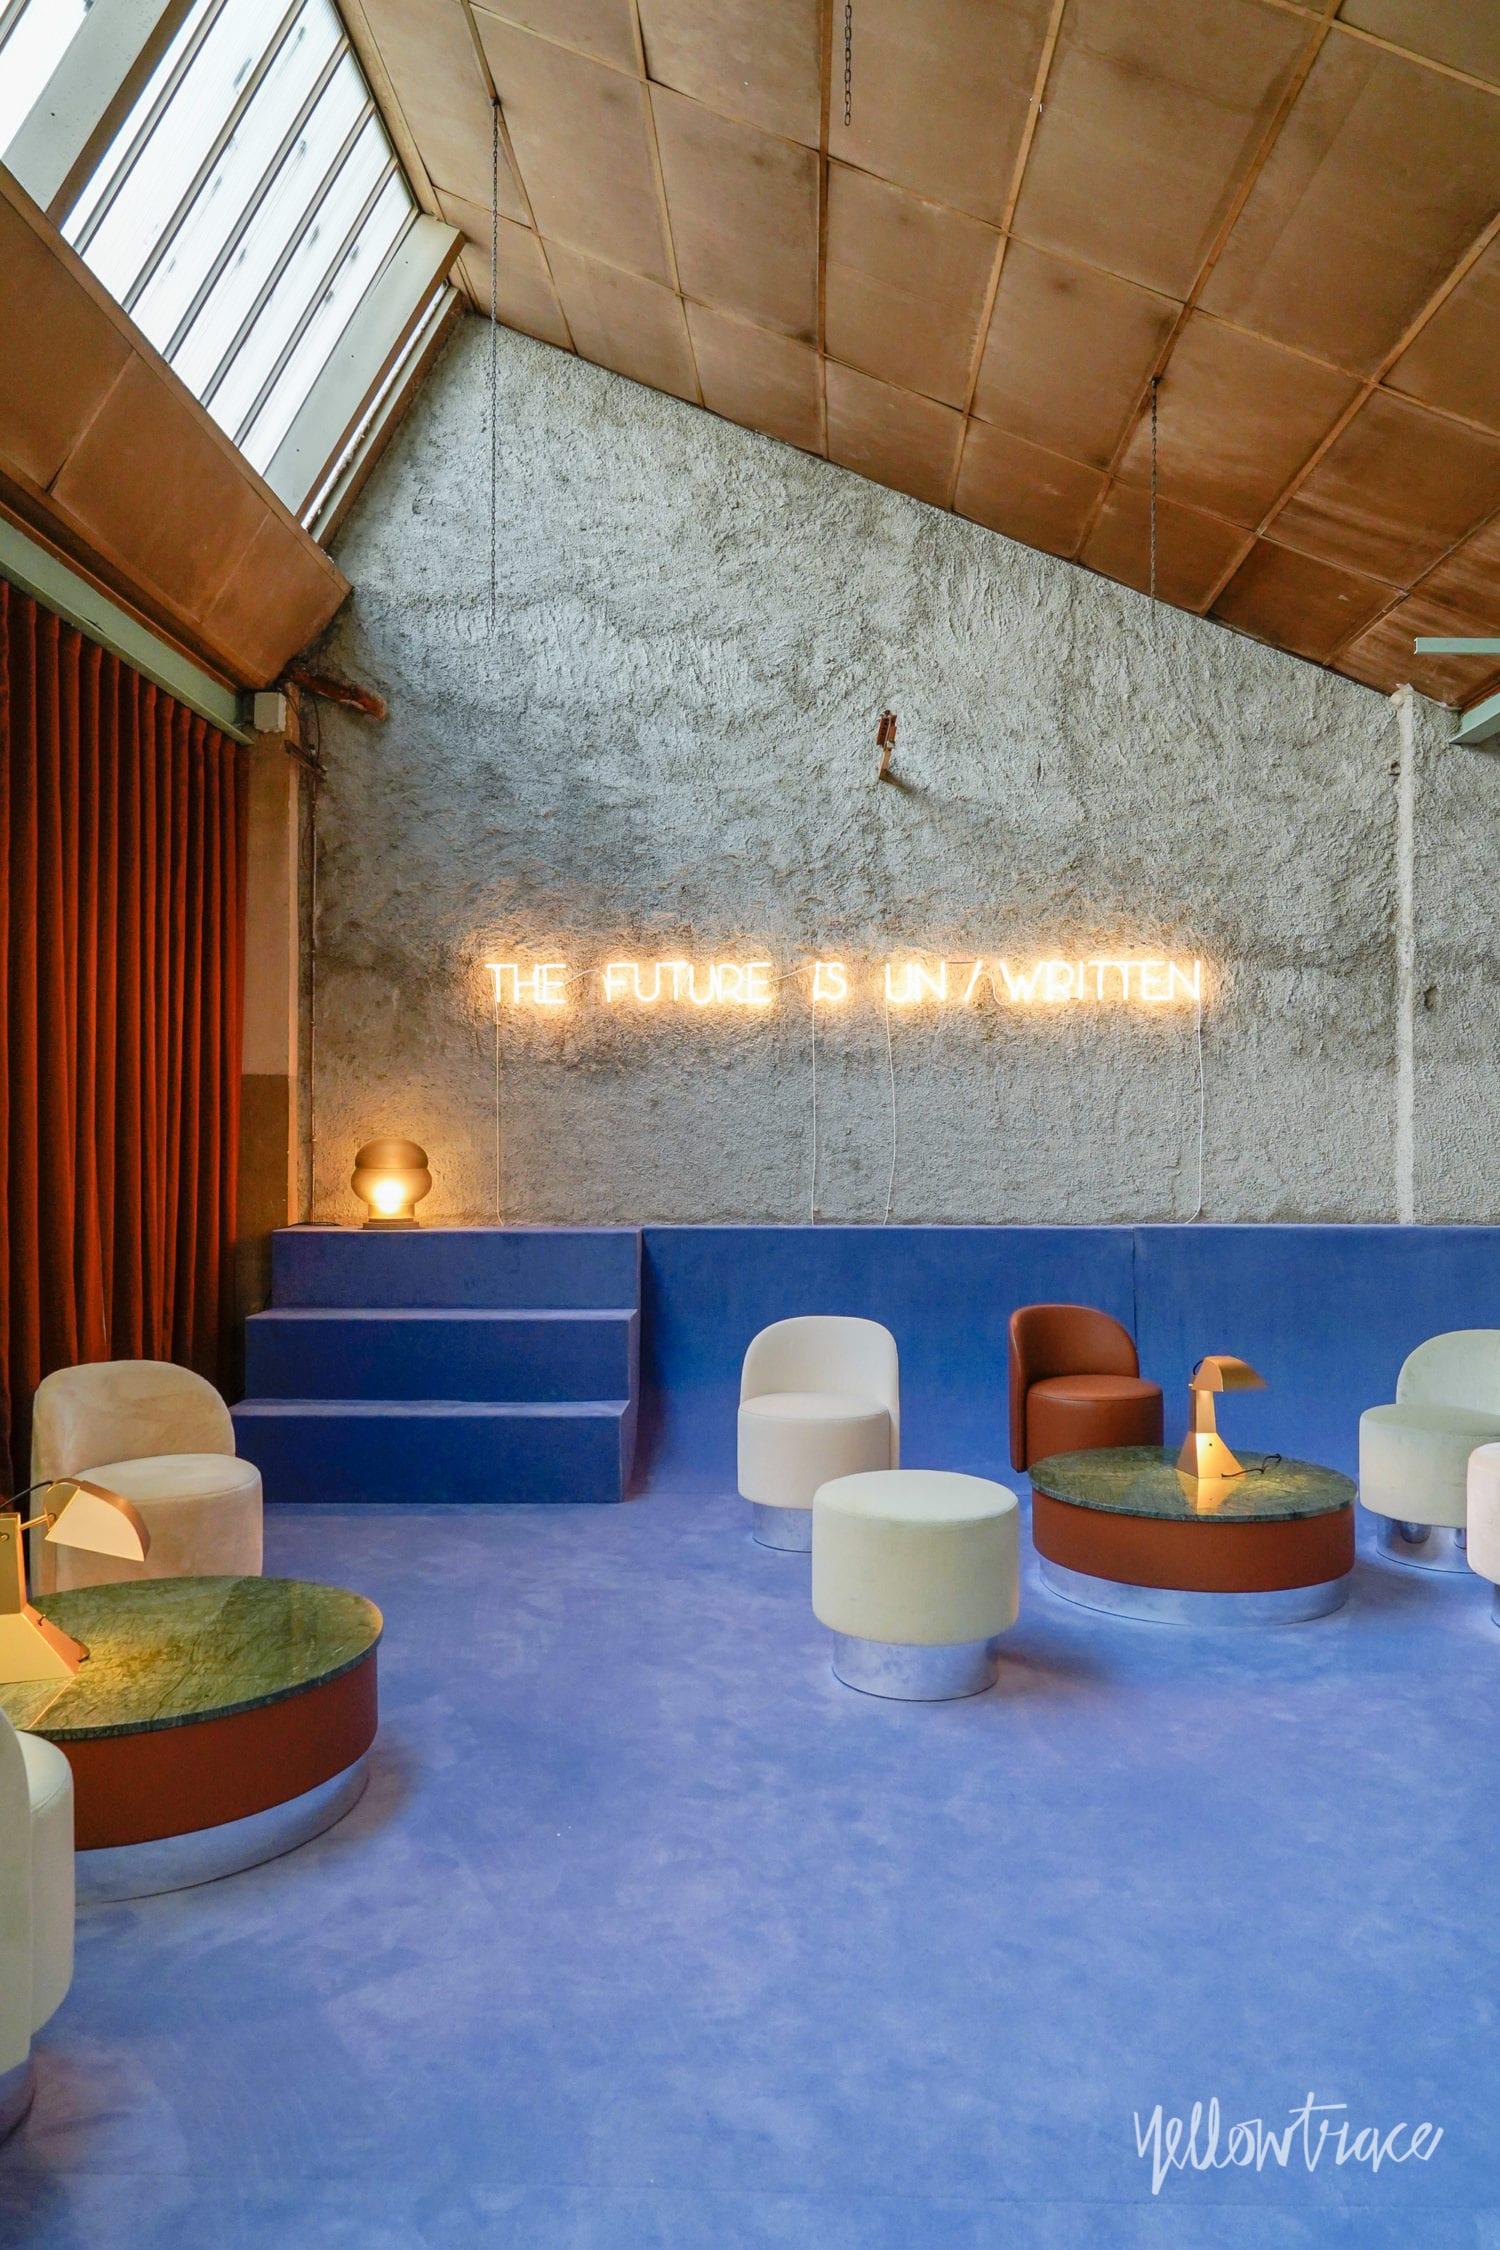 Les Arcanistes: Studiopepe's Captivating Manifesto Project at Milan Design Week 2019, Photo © Nick Hughes   Yellowtrace